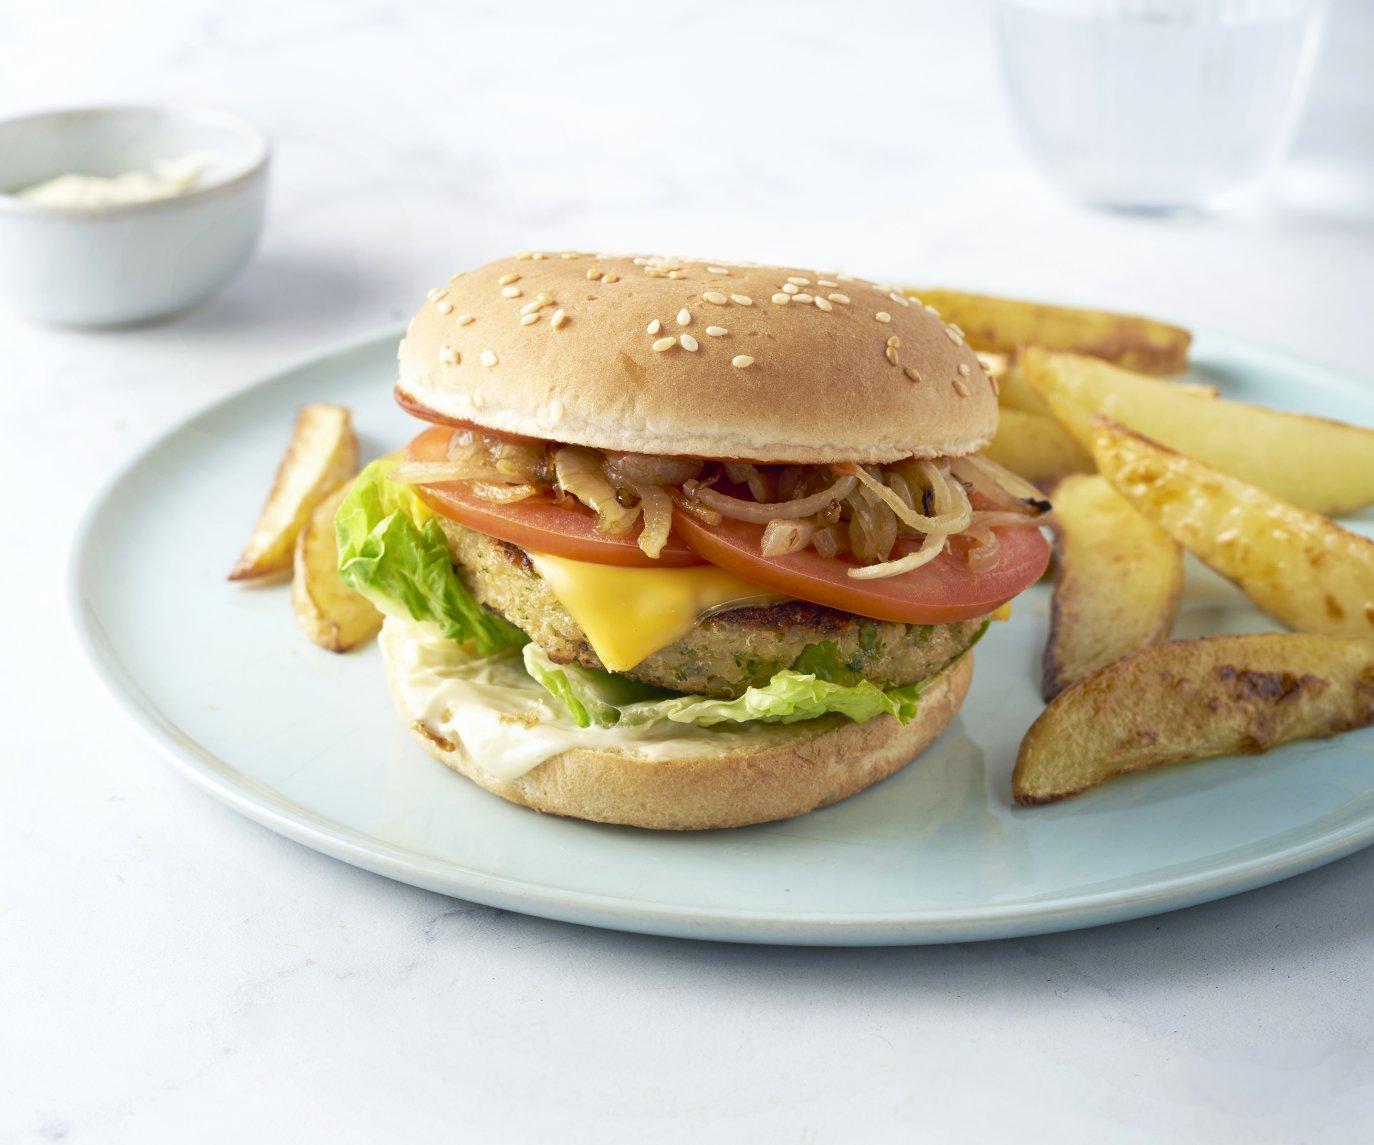 Veggie cheeseburger met aardappelwedges